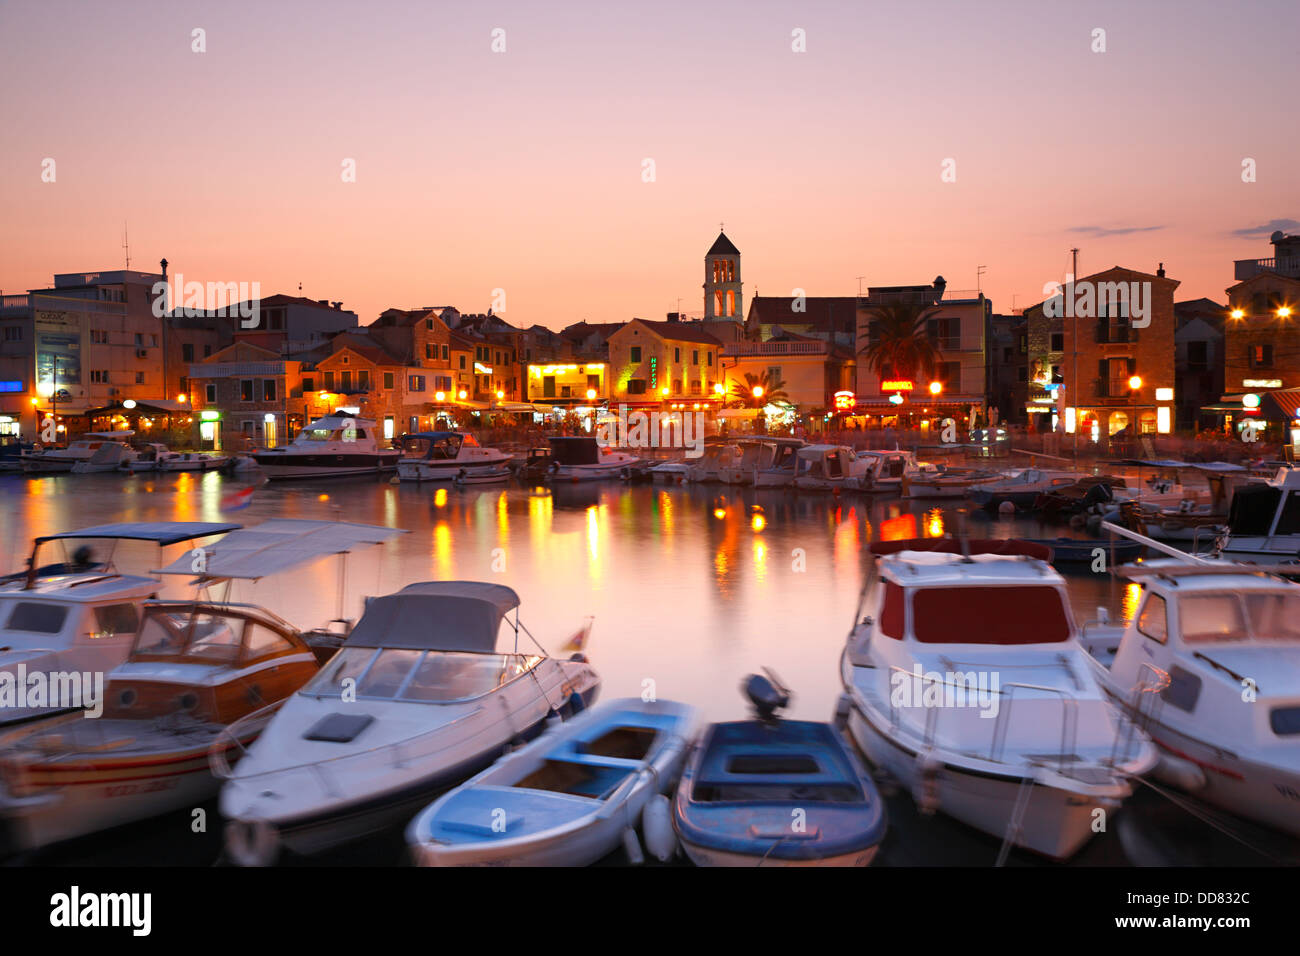 Vodice at sunset, Croatia - Stock Image